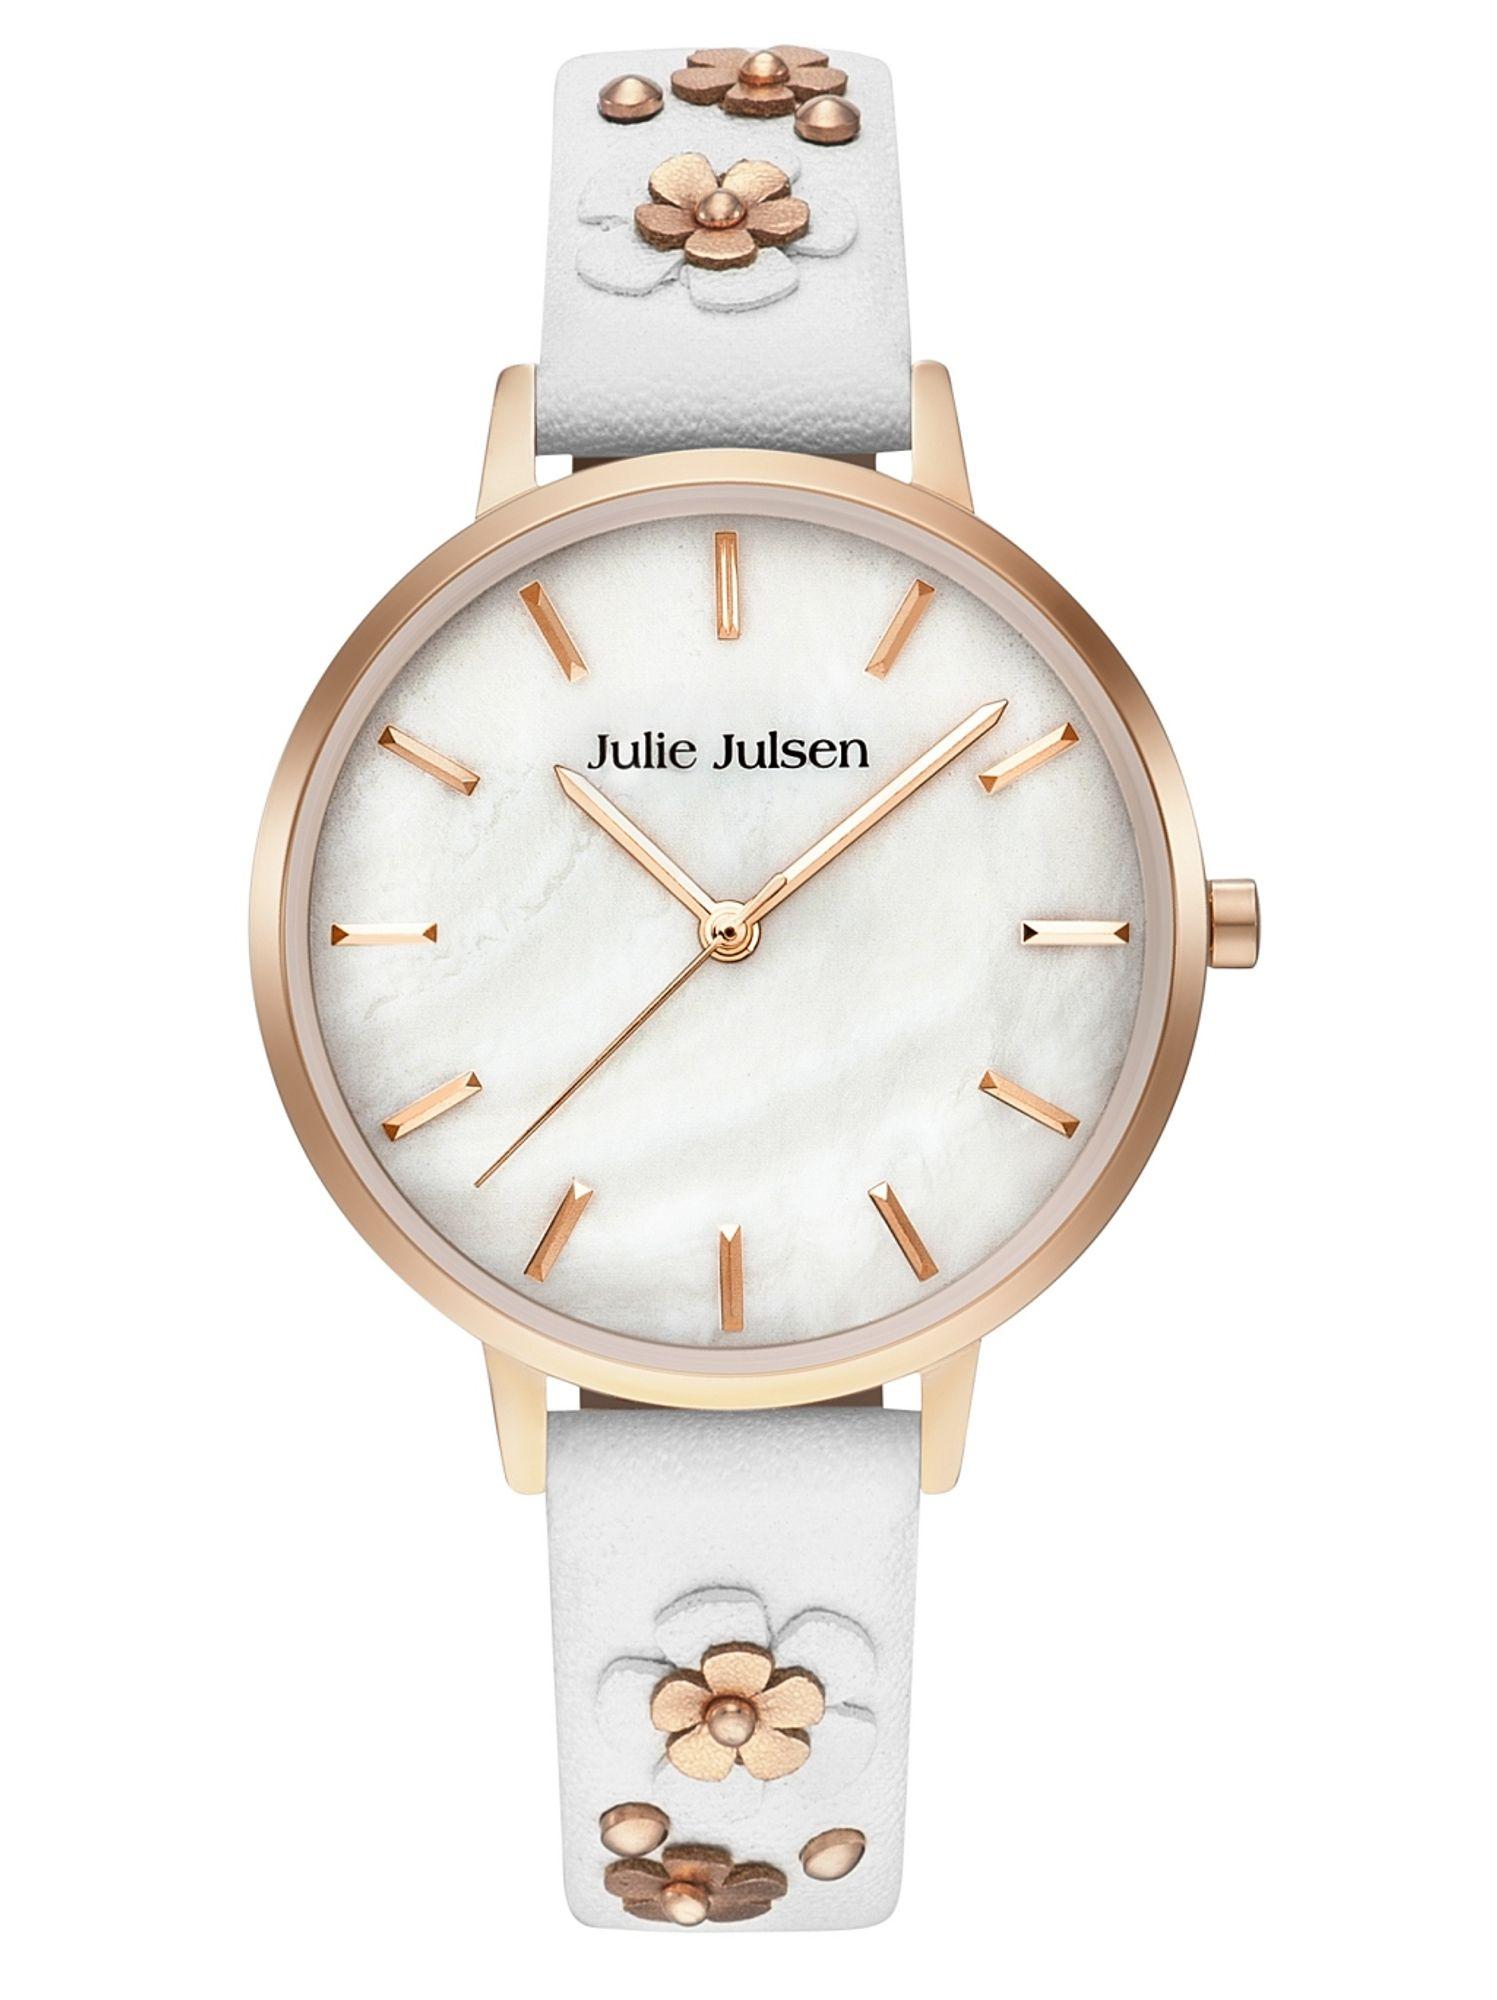 Julie Julsen JJW103RGL-9B Uhr Damenuhr Lederarmband Weiß